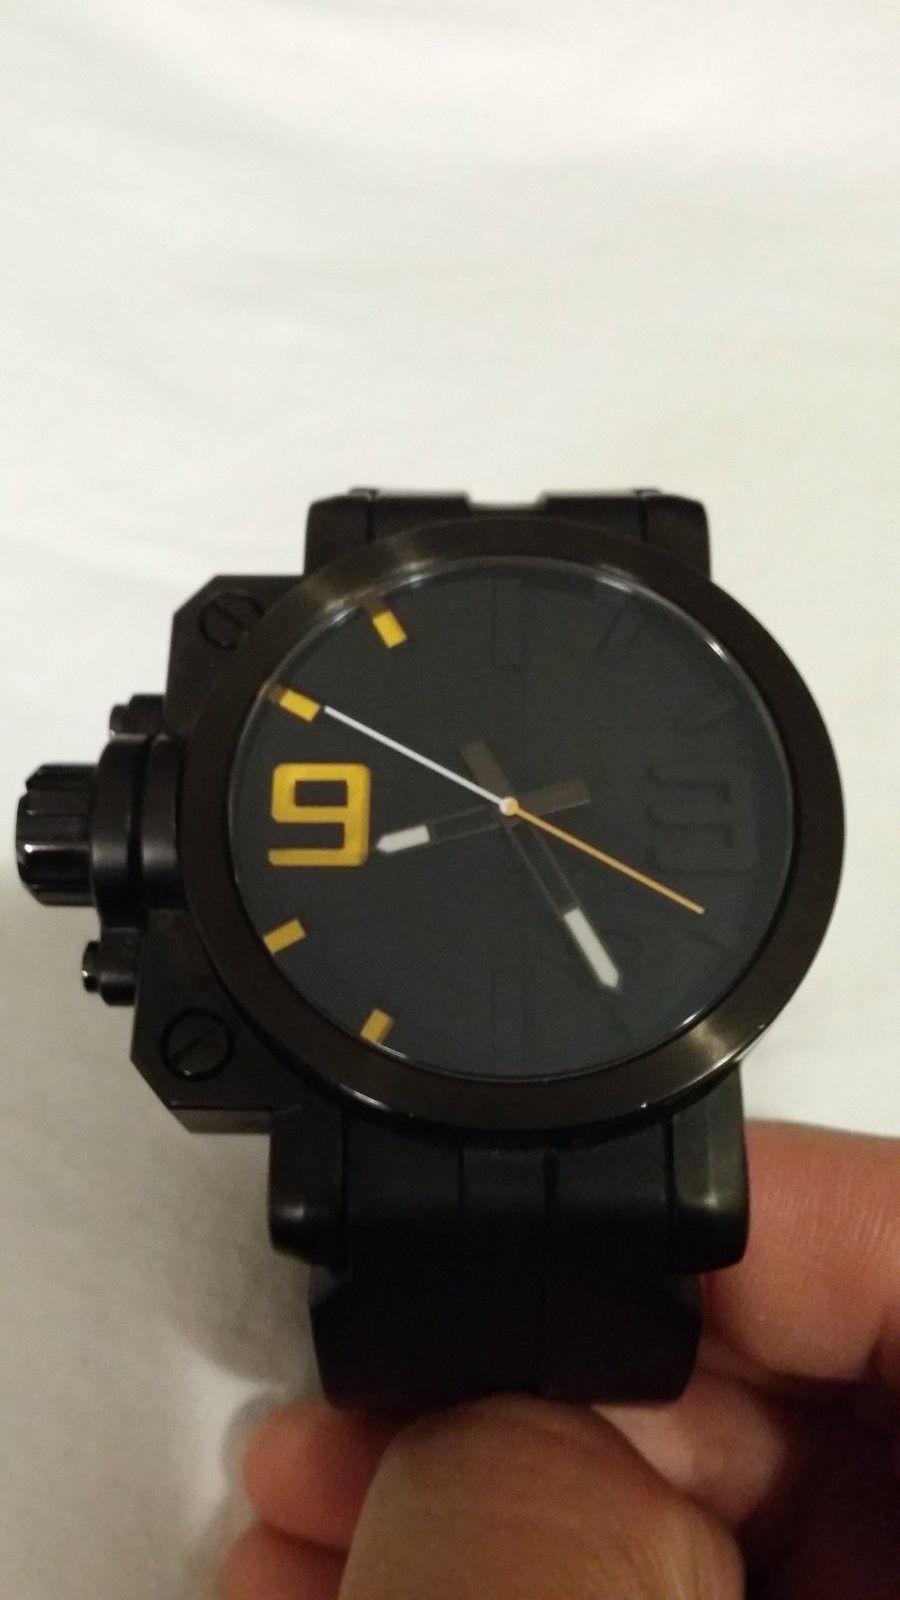 Gearbox Black/Yellow. Price drop! $250 - 20150831_202357.jpg